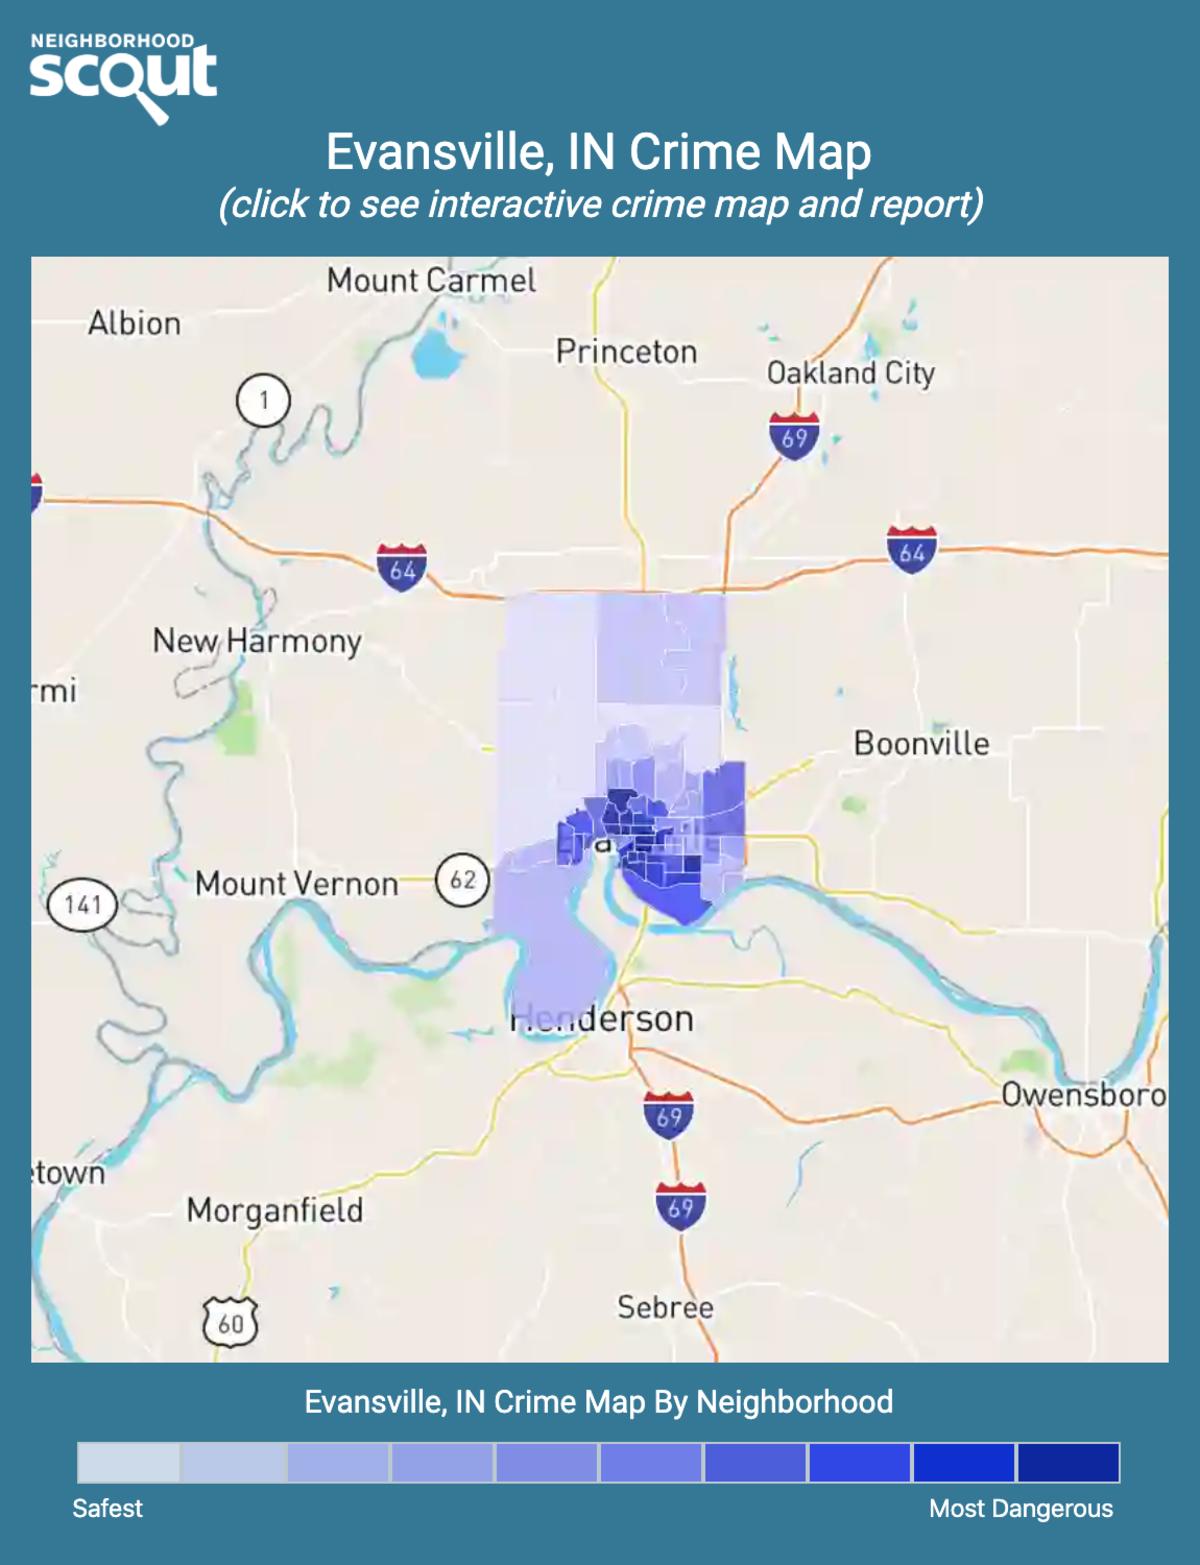 Evansville, Indiana crime map